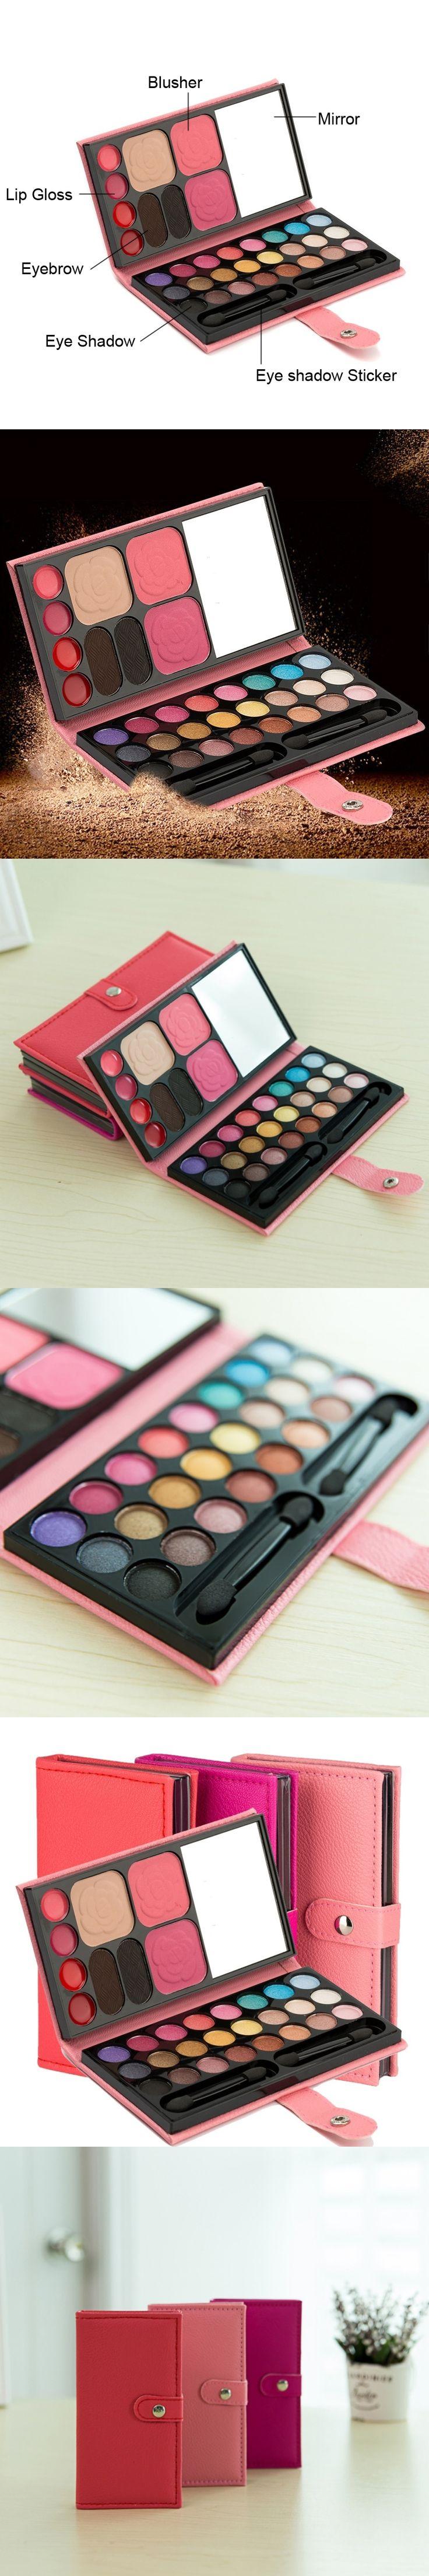 New Eyeshadow Set for Women Complexion Makeup Palette Eyeshadow Make Up Palette 33 Professional Pigment Matte paleta de sombra